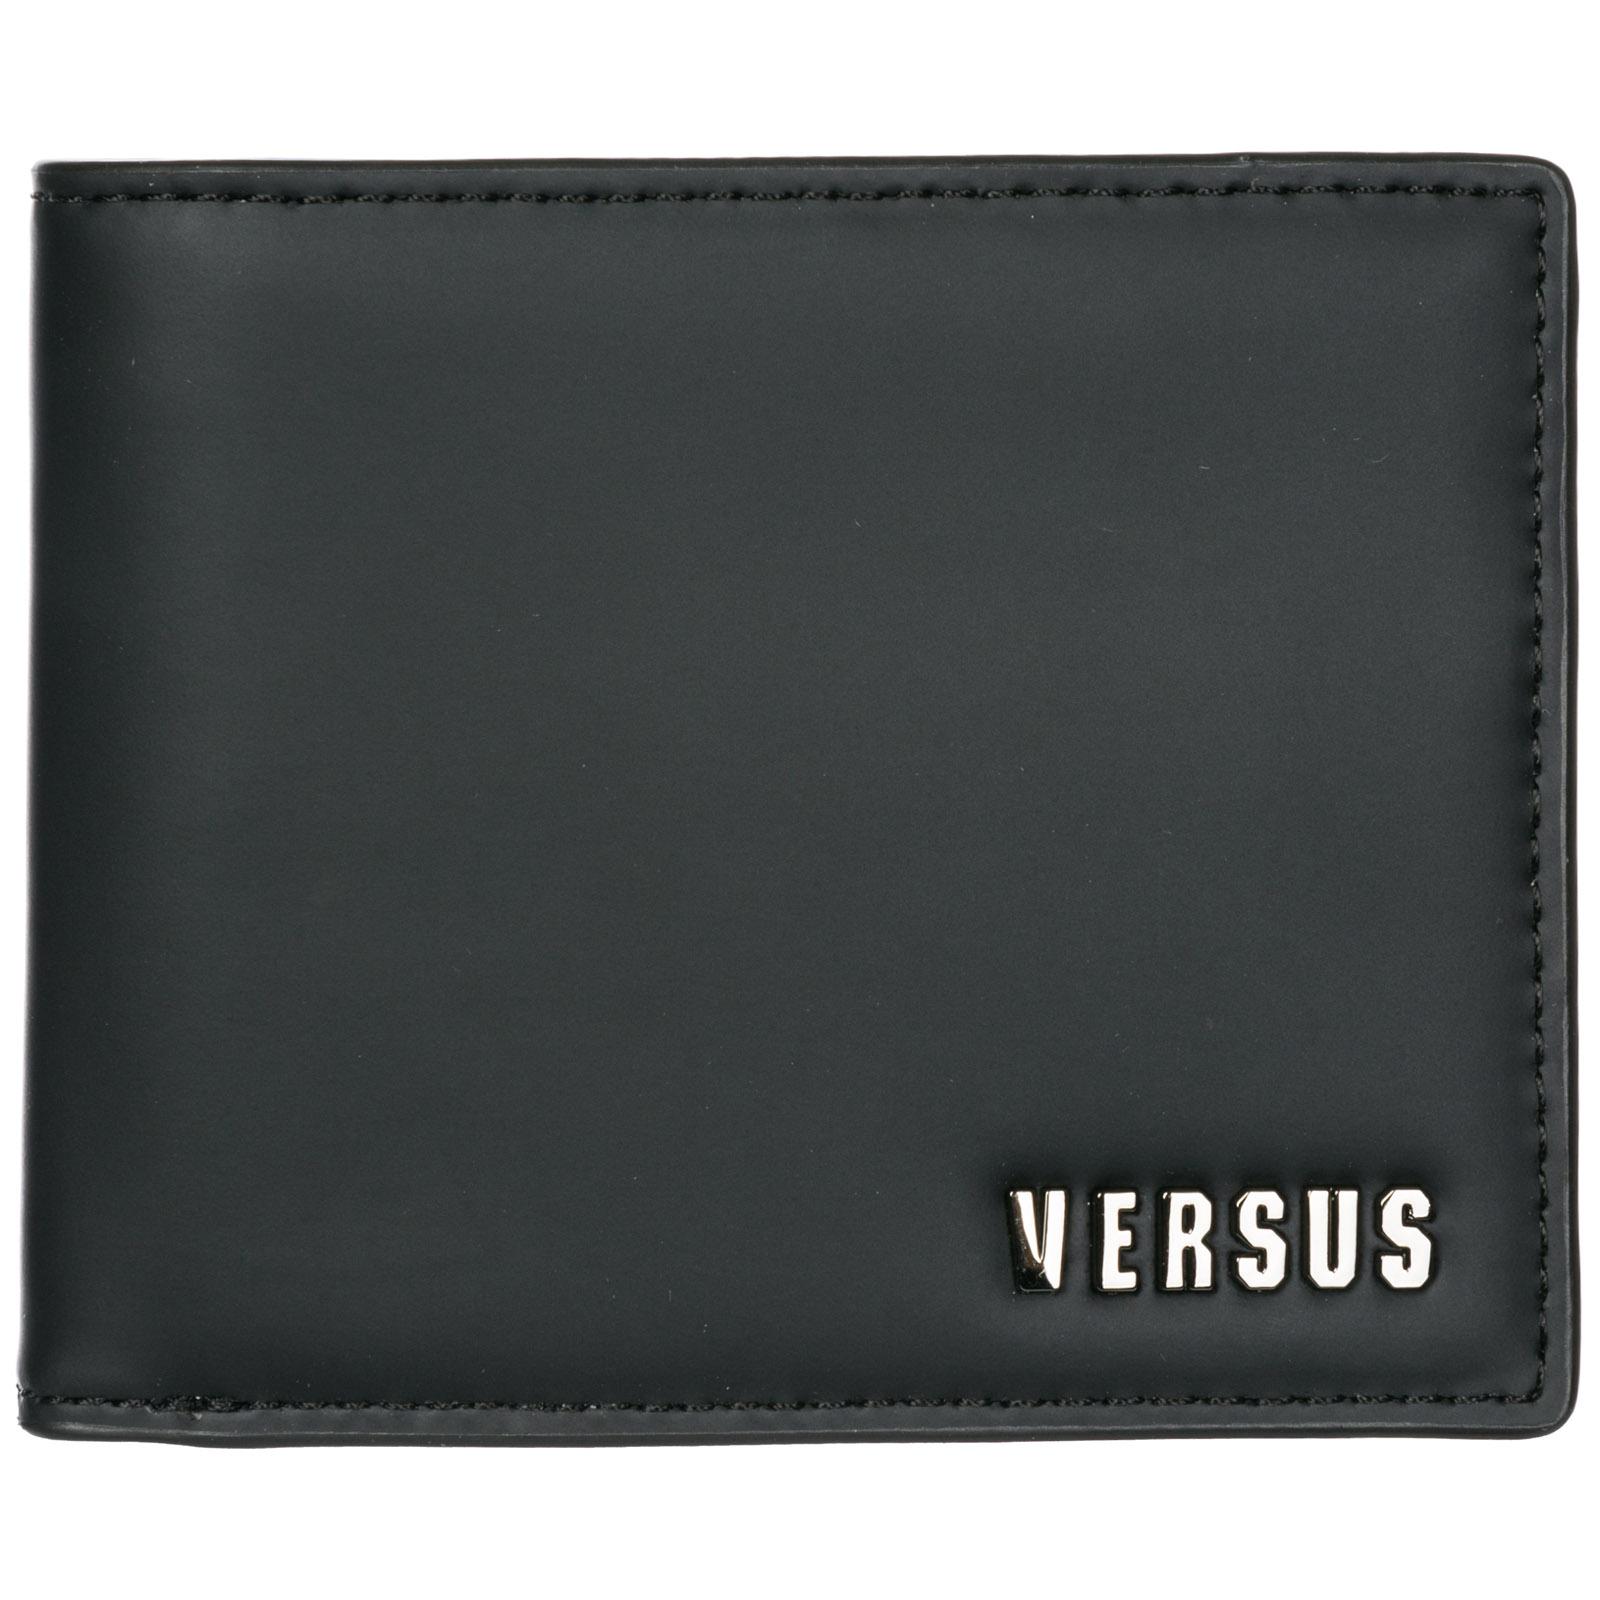 online store b0110 6fac8 Men's genuine leather wallet credit card bifold